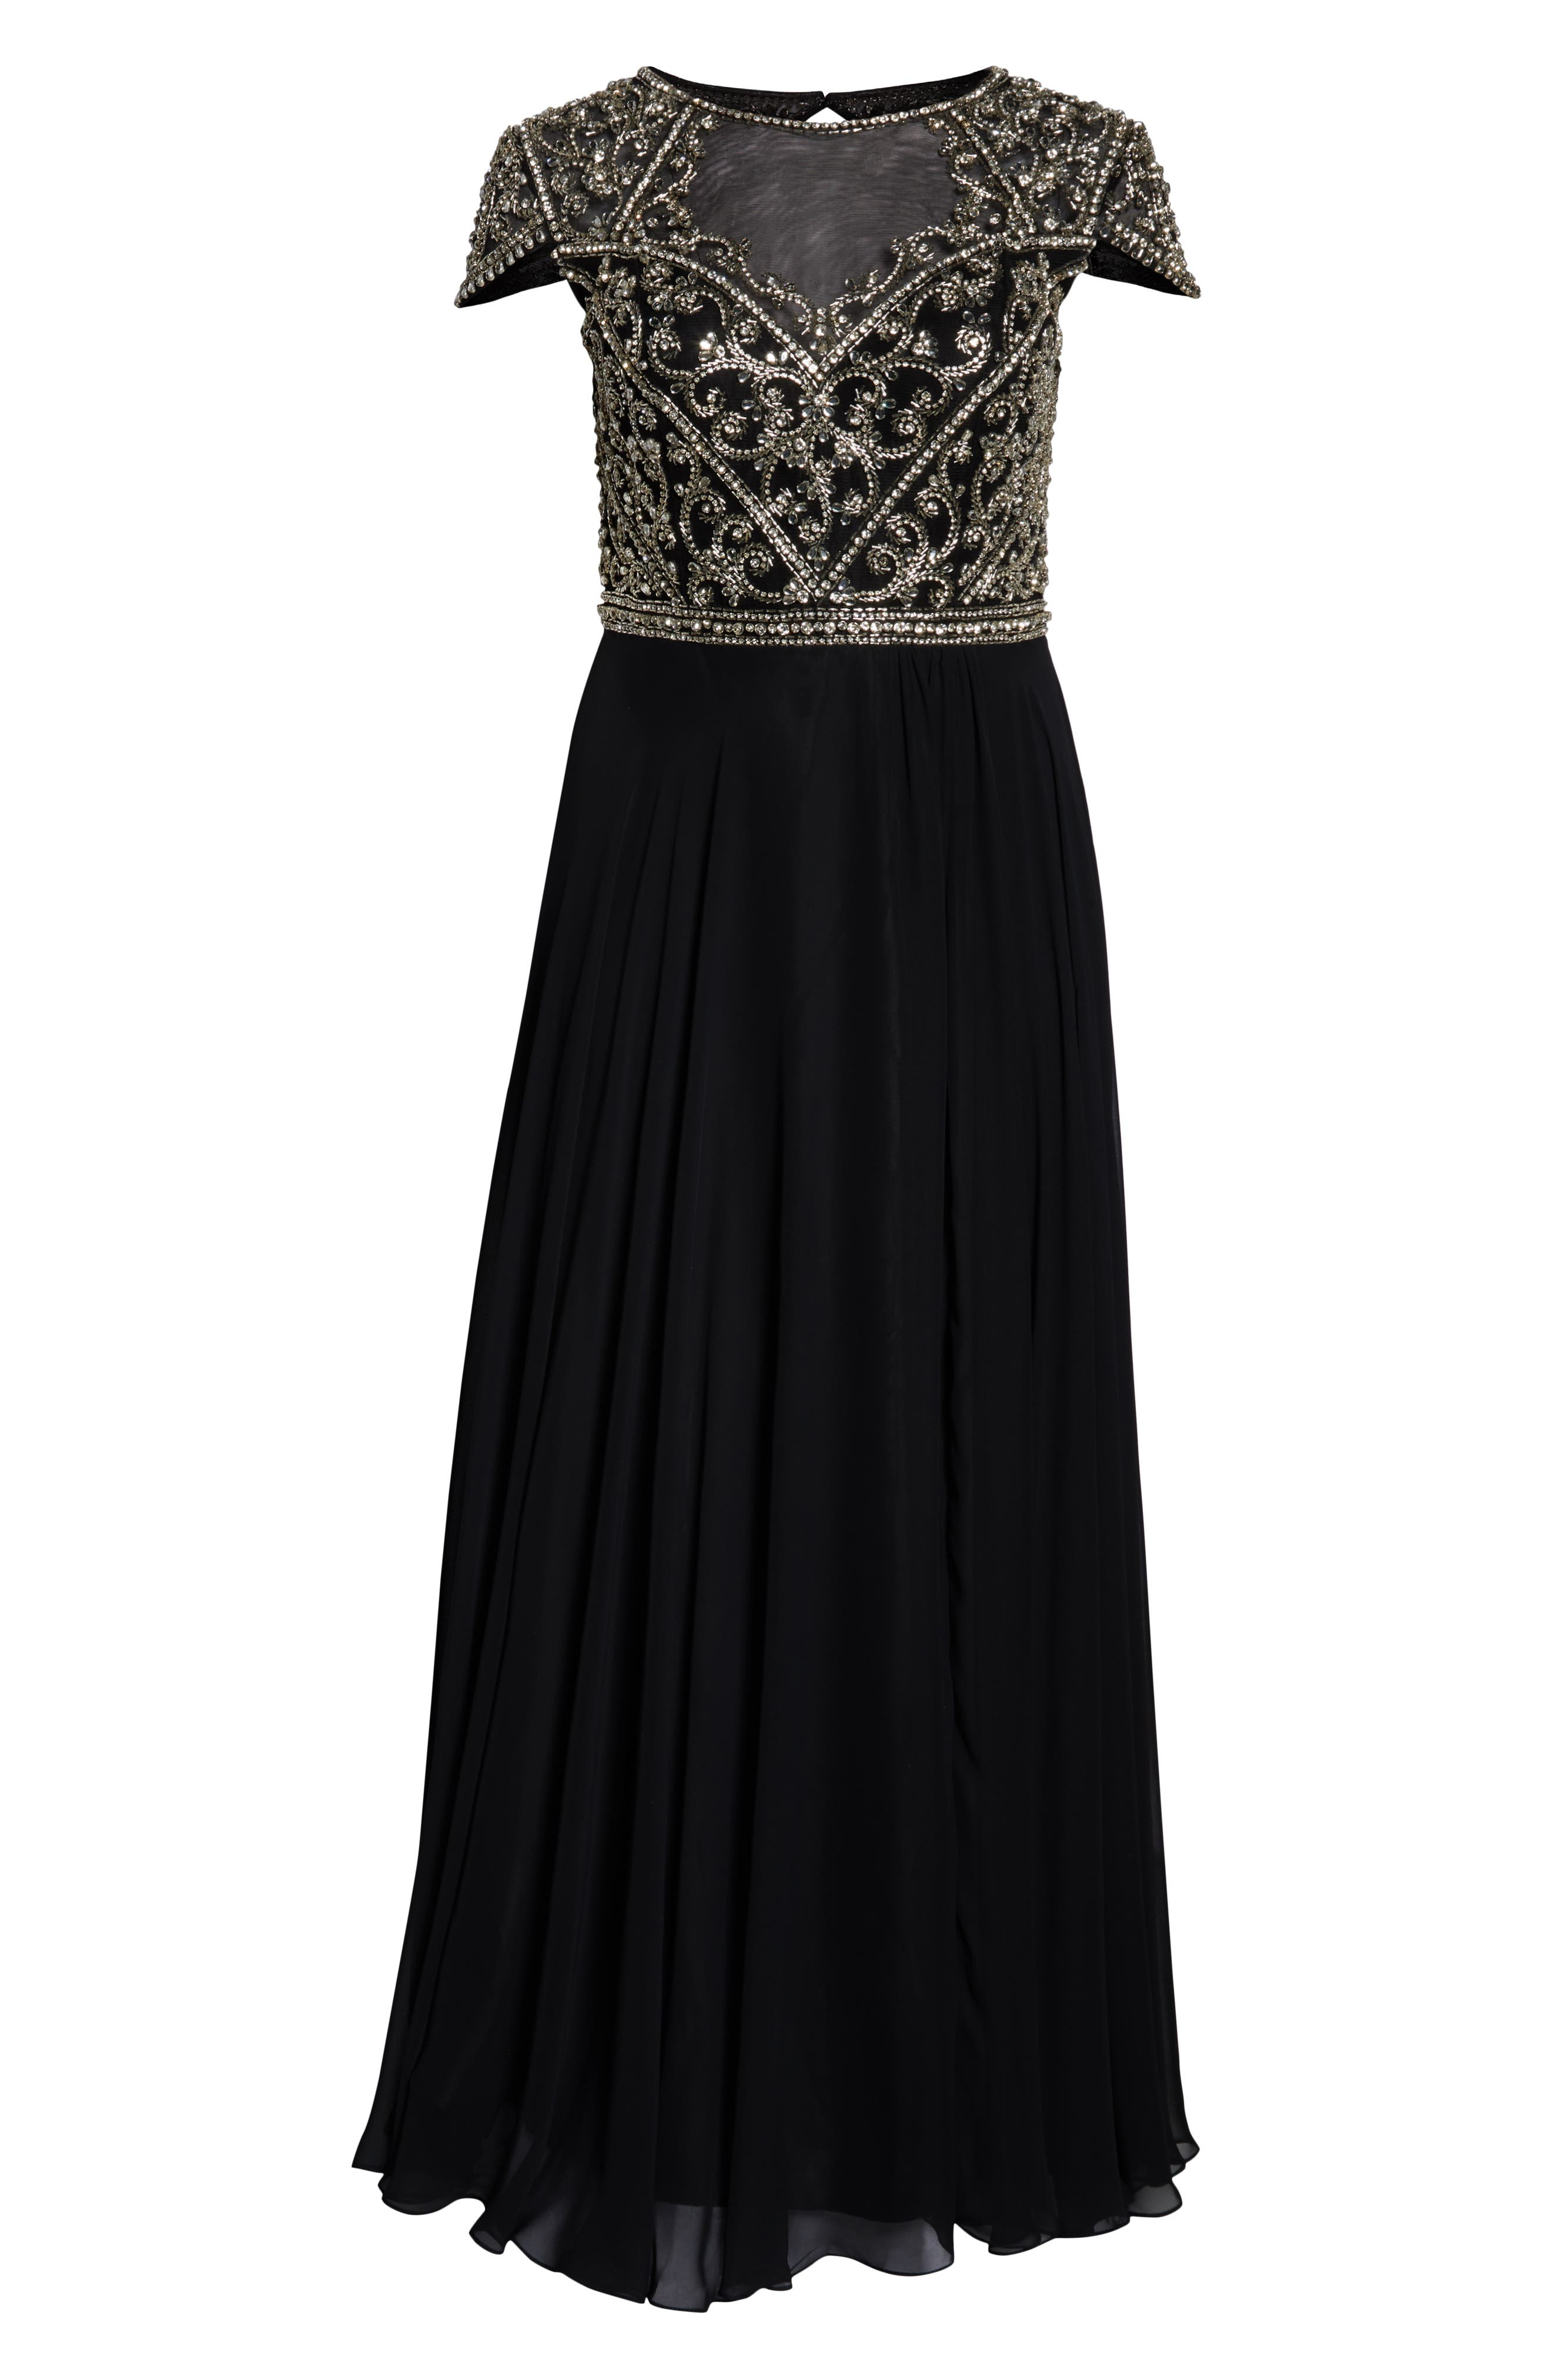 MAC DUGGAL, Embellished Bodice Evening Dress, Alternate thumbnail 7, color, BLACK